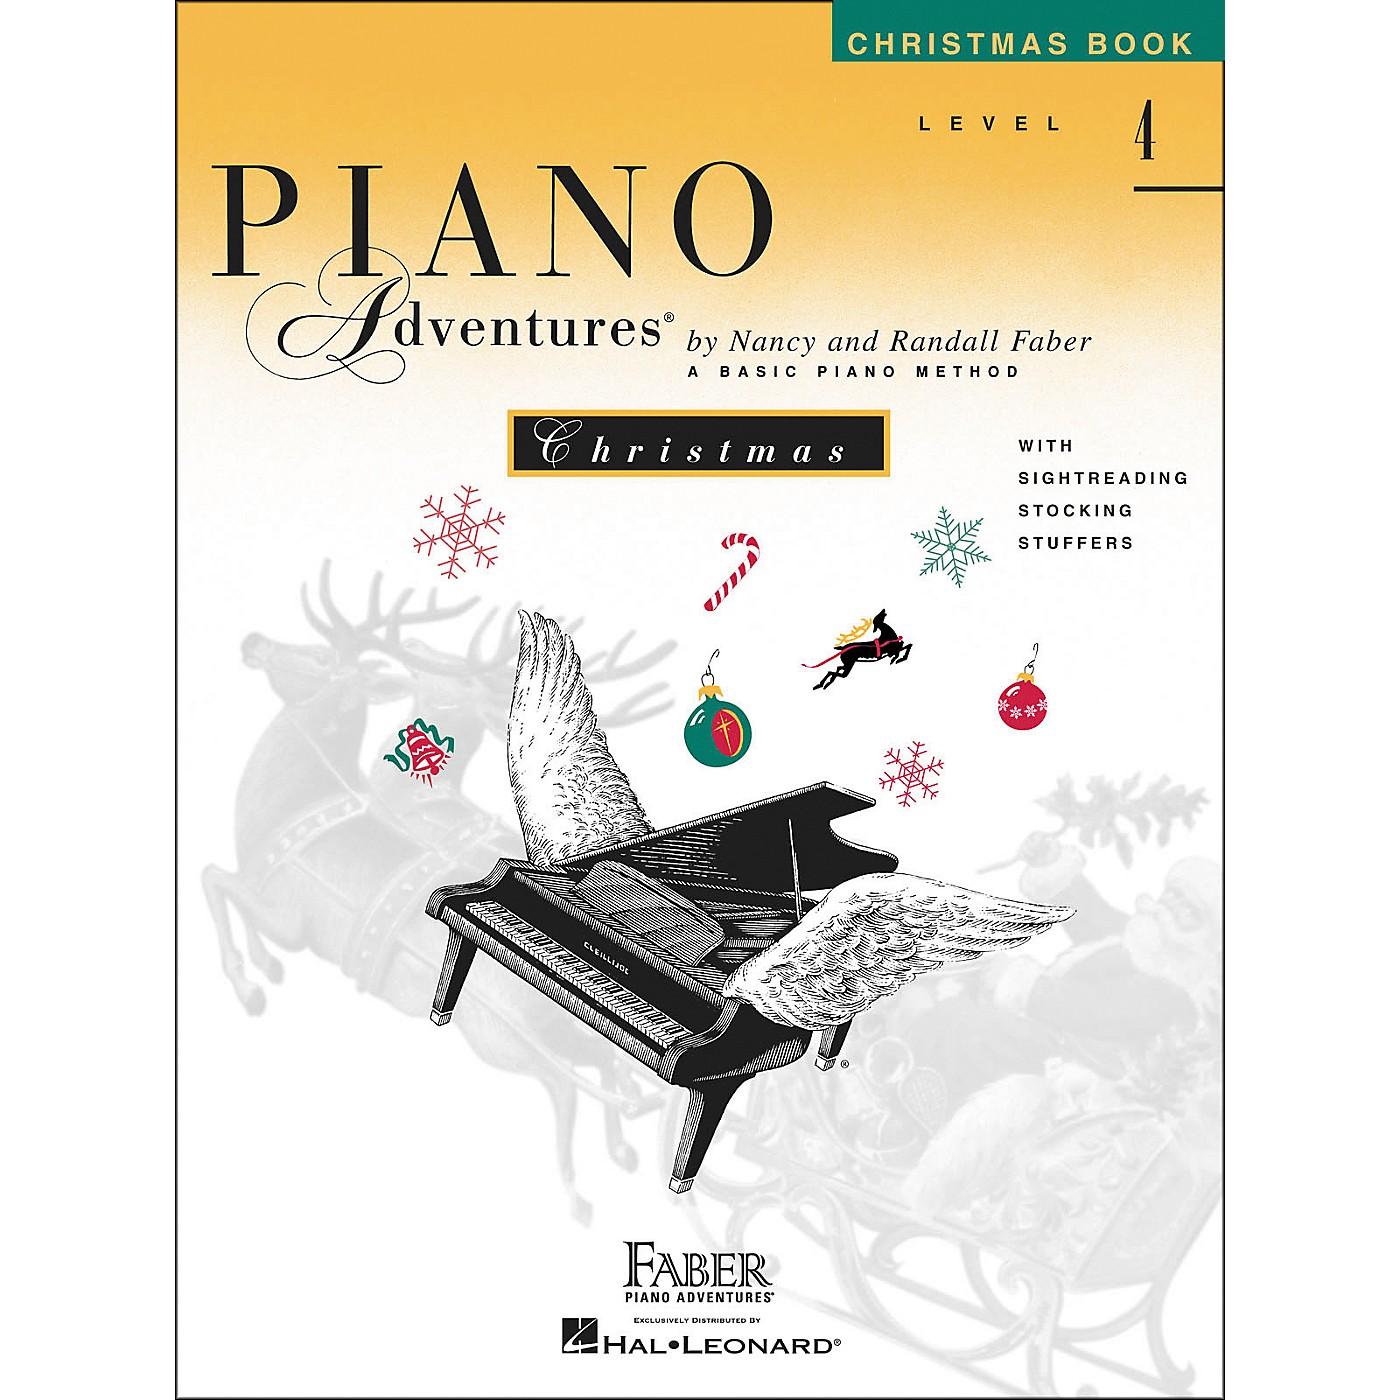 Faber Piano Adventures Piano Adventures Christmas Book Level 4 - Faber Piano thumbnail